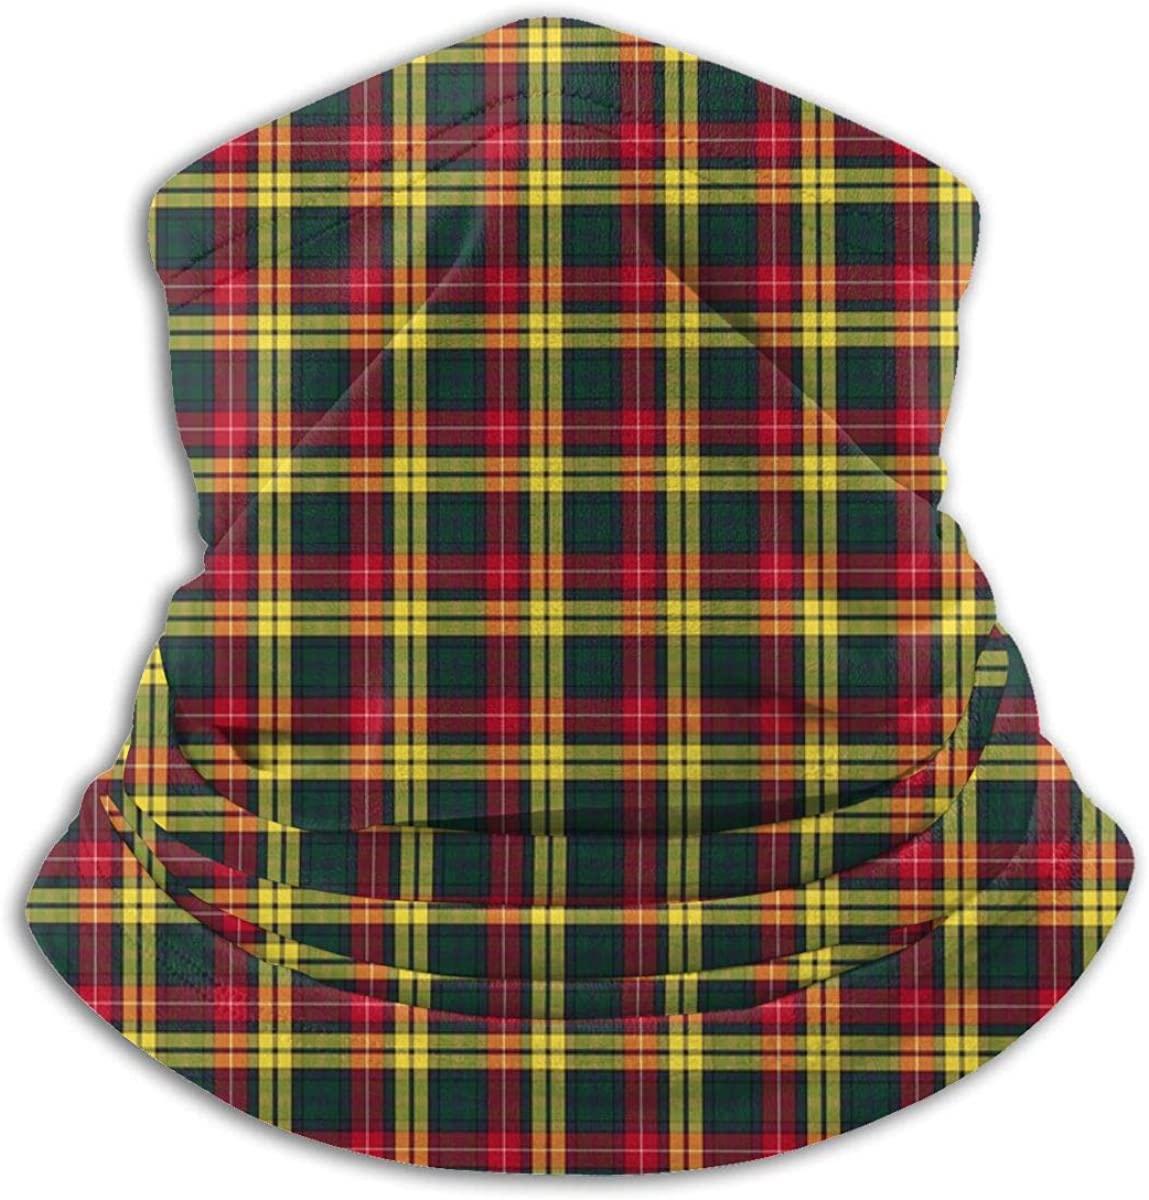 Neck Warmer Gaiter Headwear Multifunctional Head Scarf- Windproof Ski Motorcycle Mask Red Yellow And Green Buchanan Clan Tartan Printed